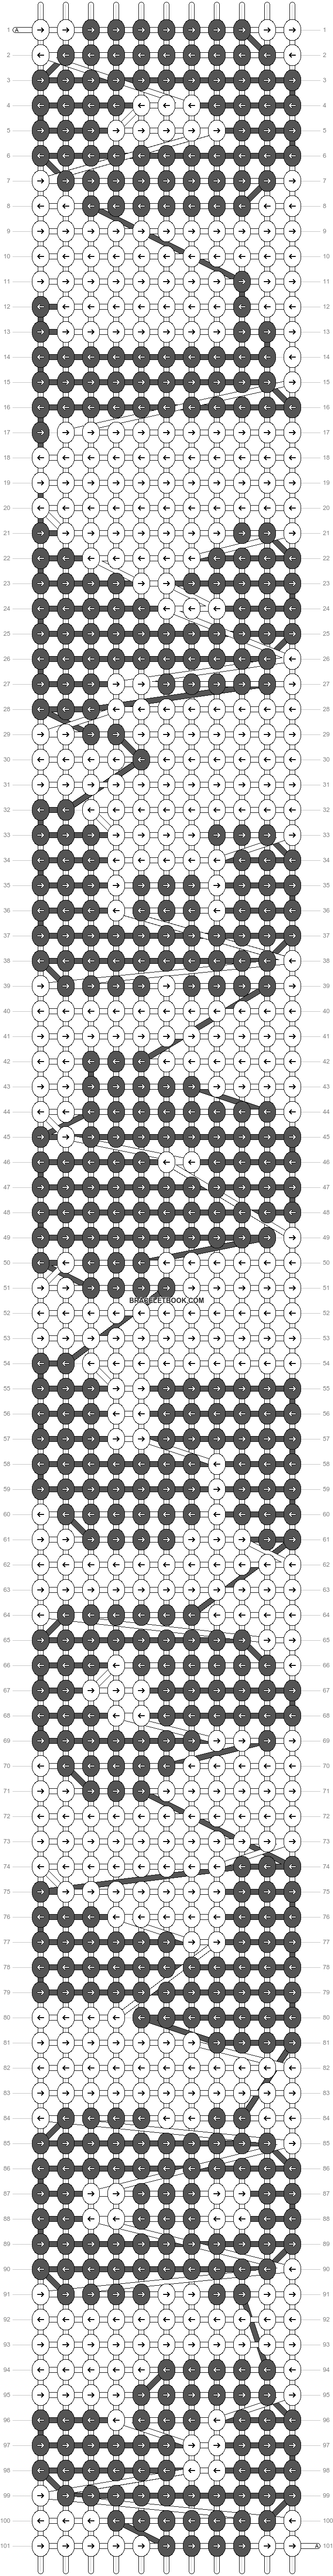 Alpha pattern #7681 pattern